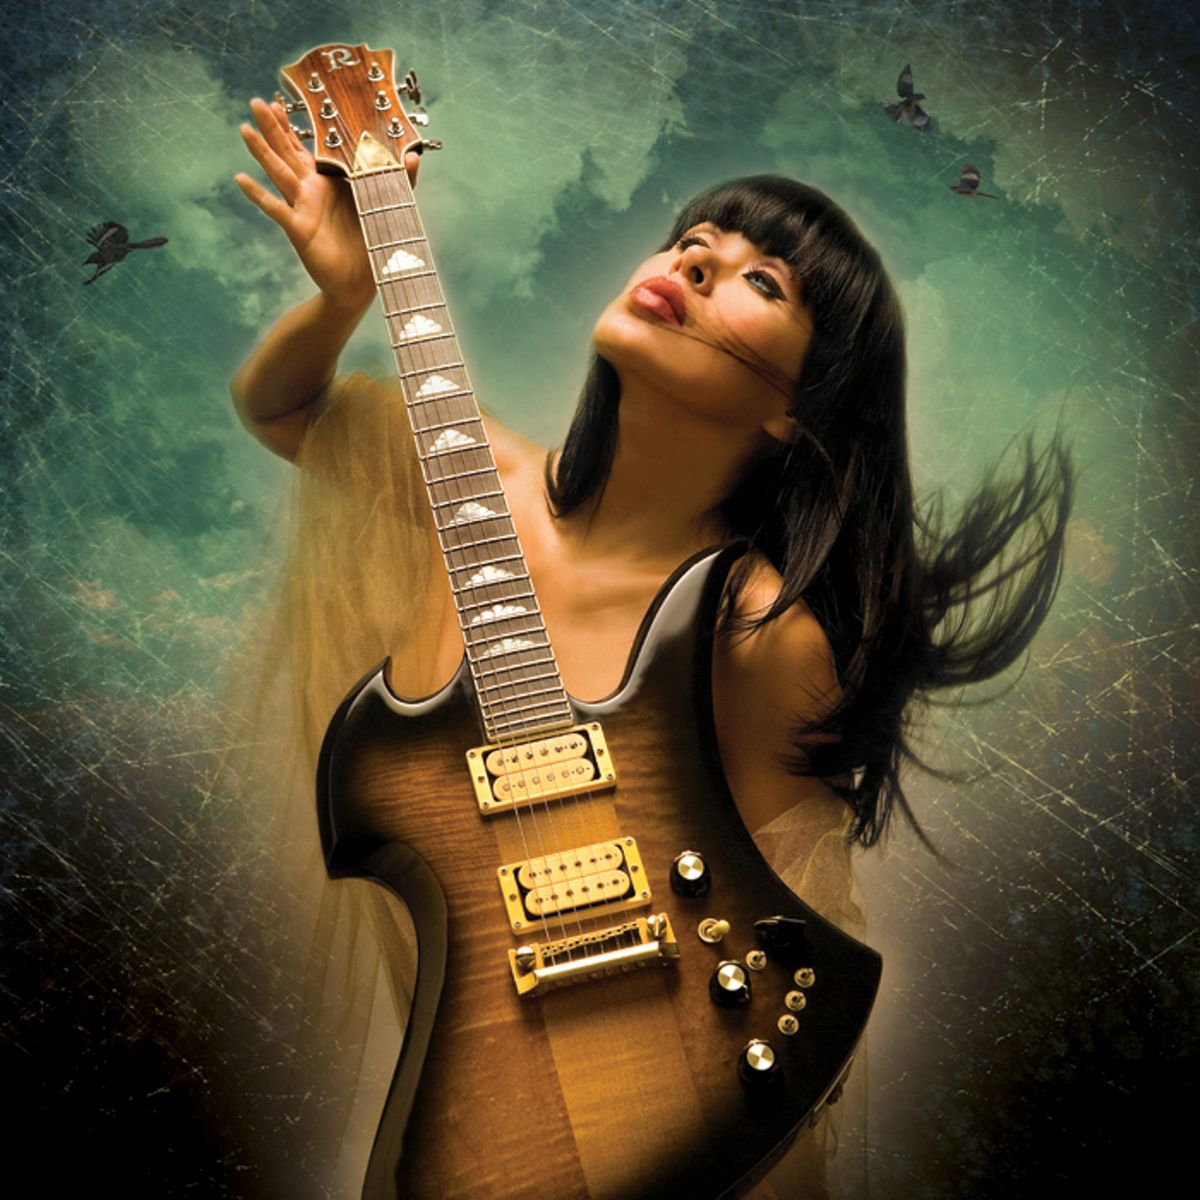 Guitar_10.jpg